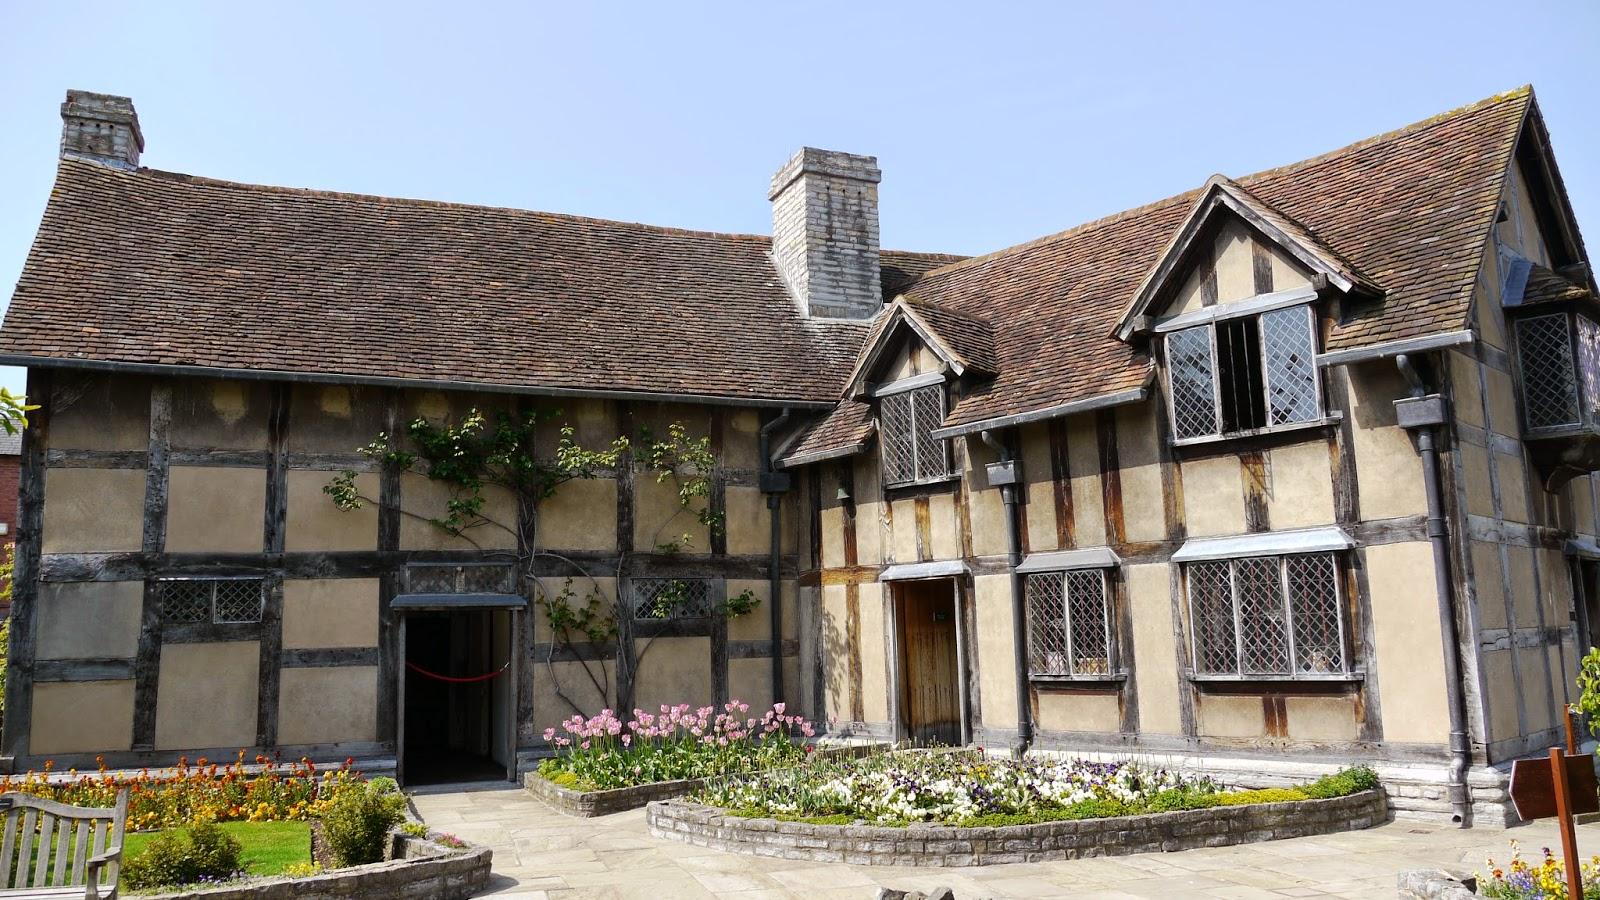 shakespeare's birthplace, stratford upon avon, uk